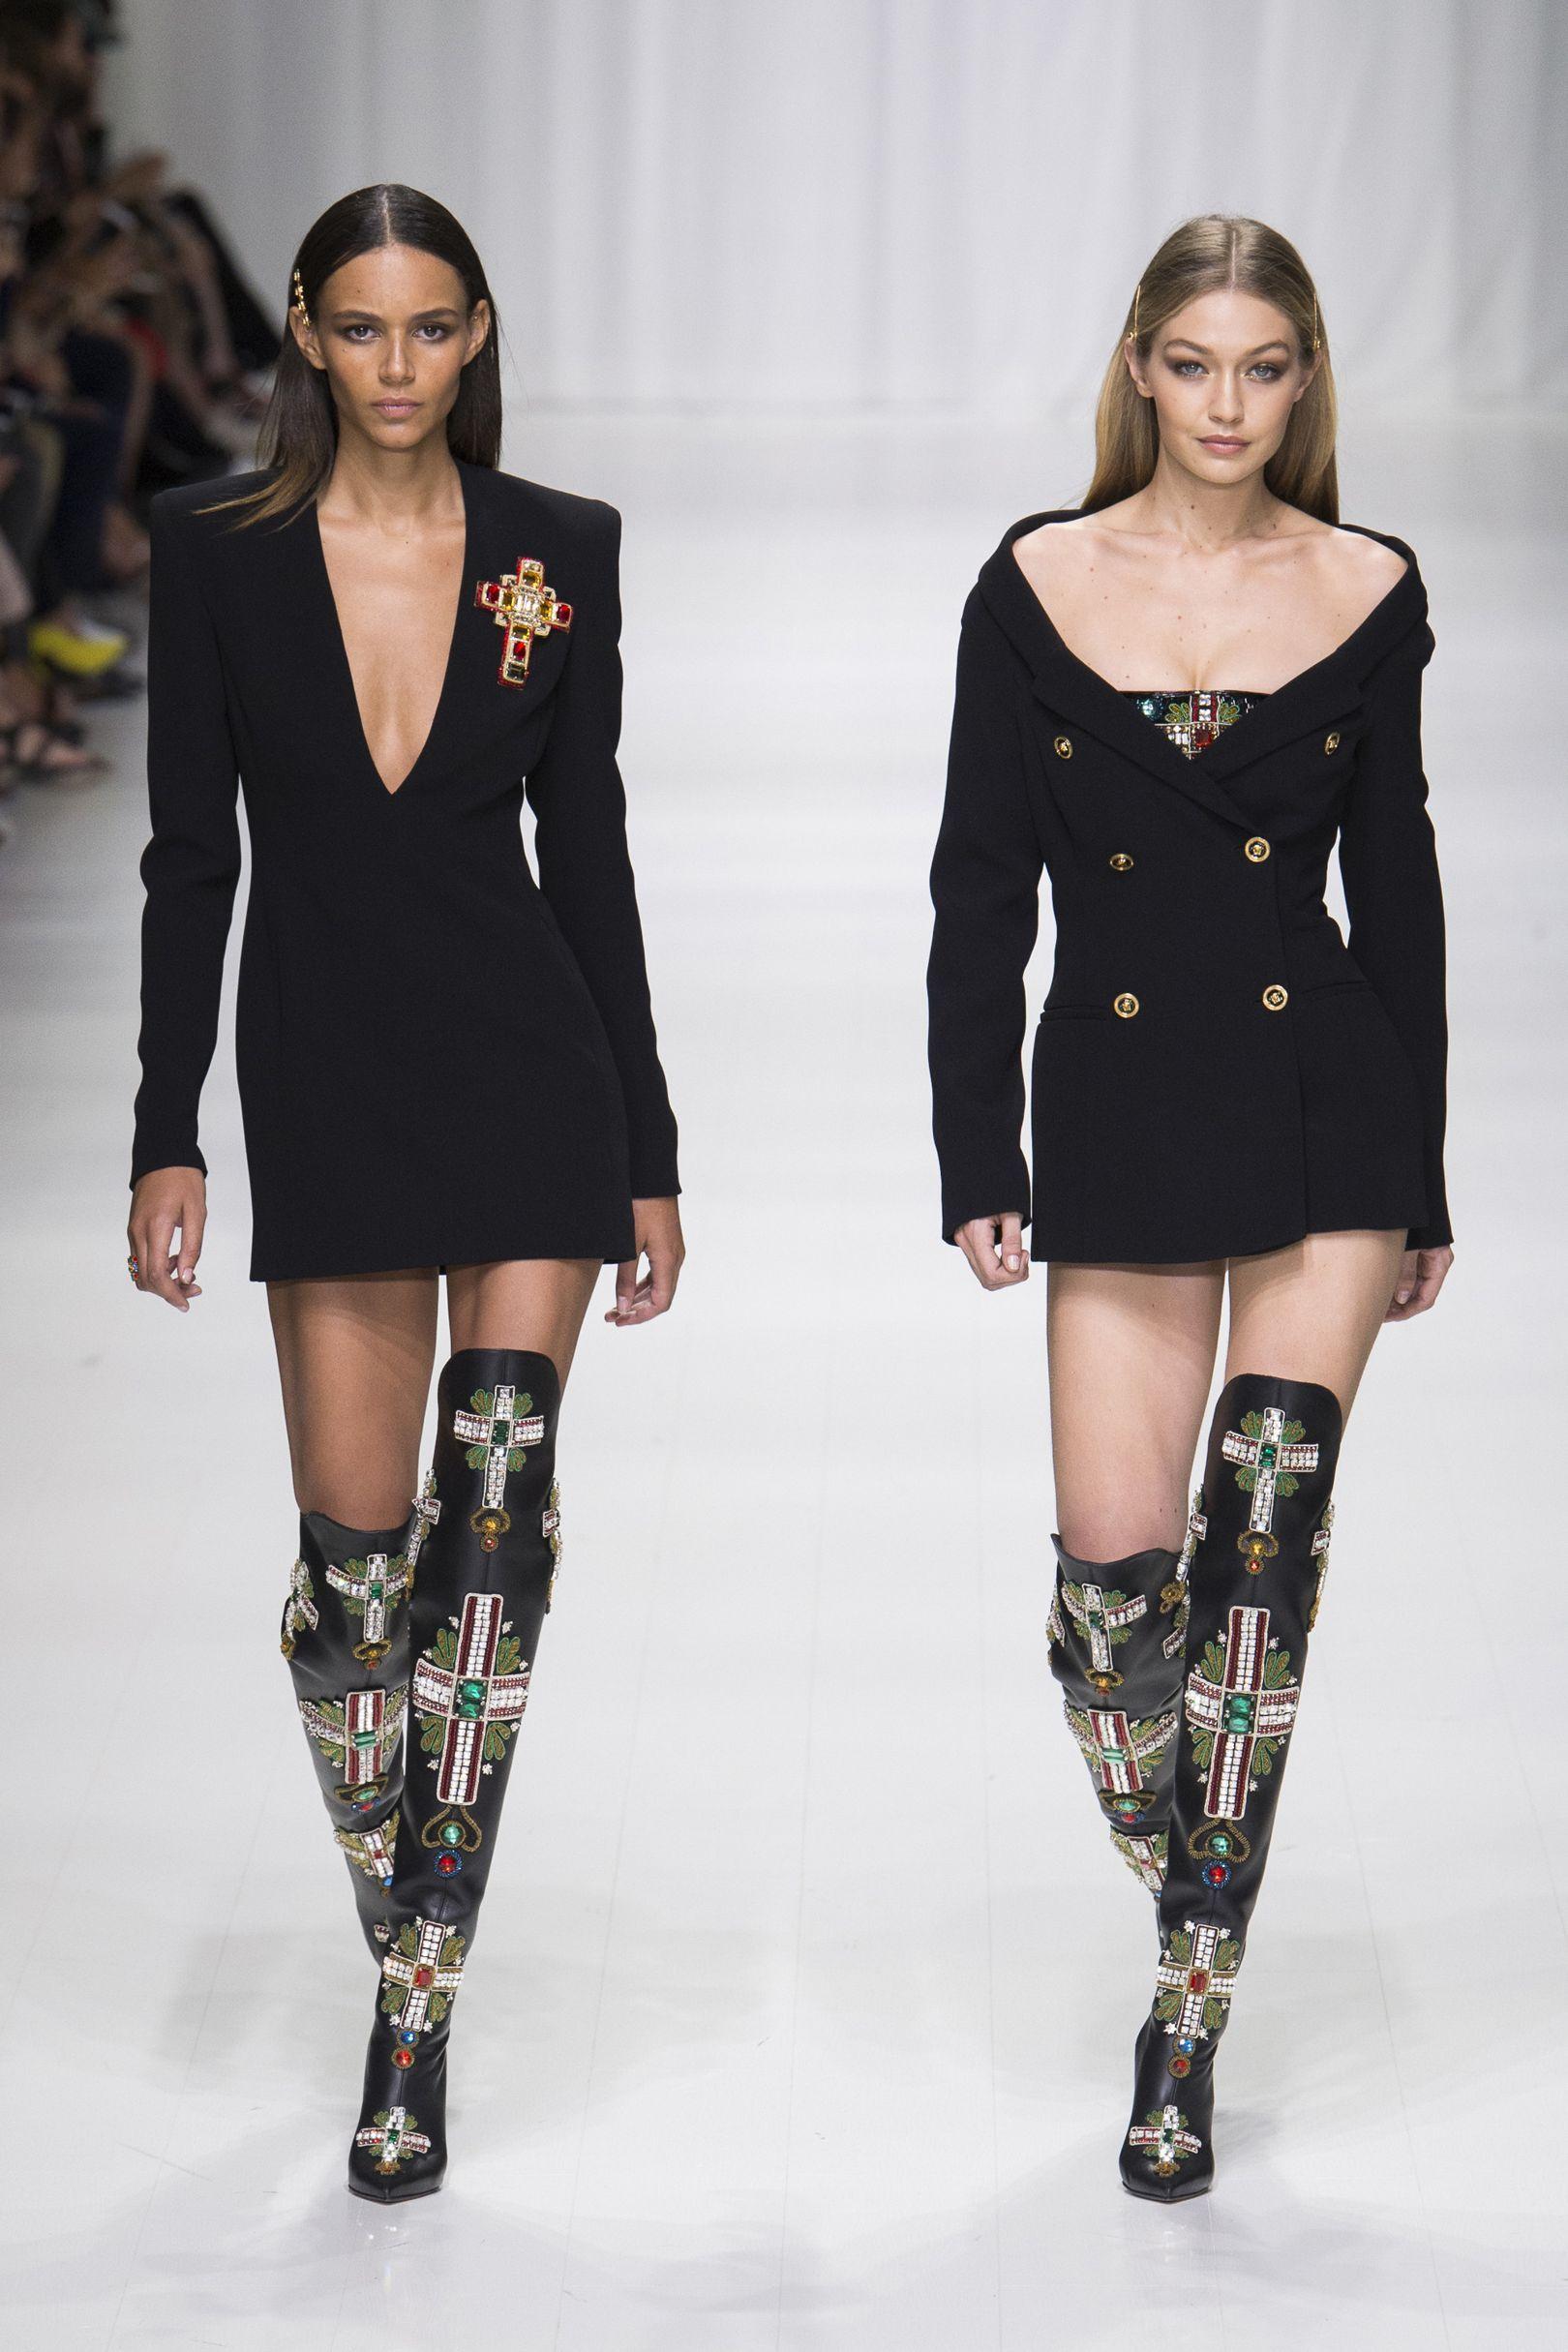 93283e9eead Versace Spring/Summer 2018 Ready To Wear | fashion | Fashion ...